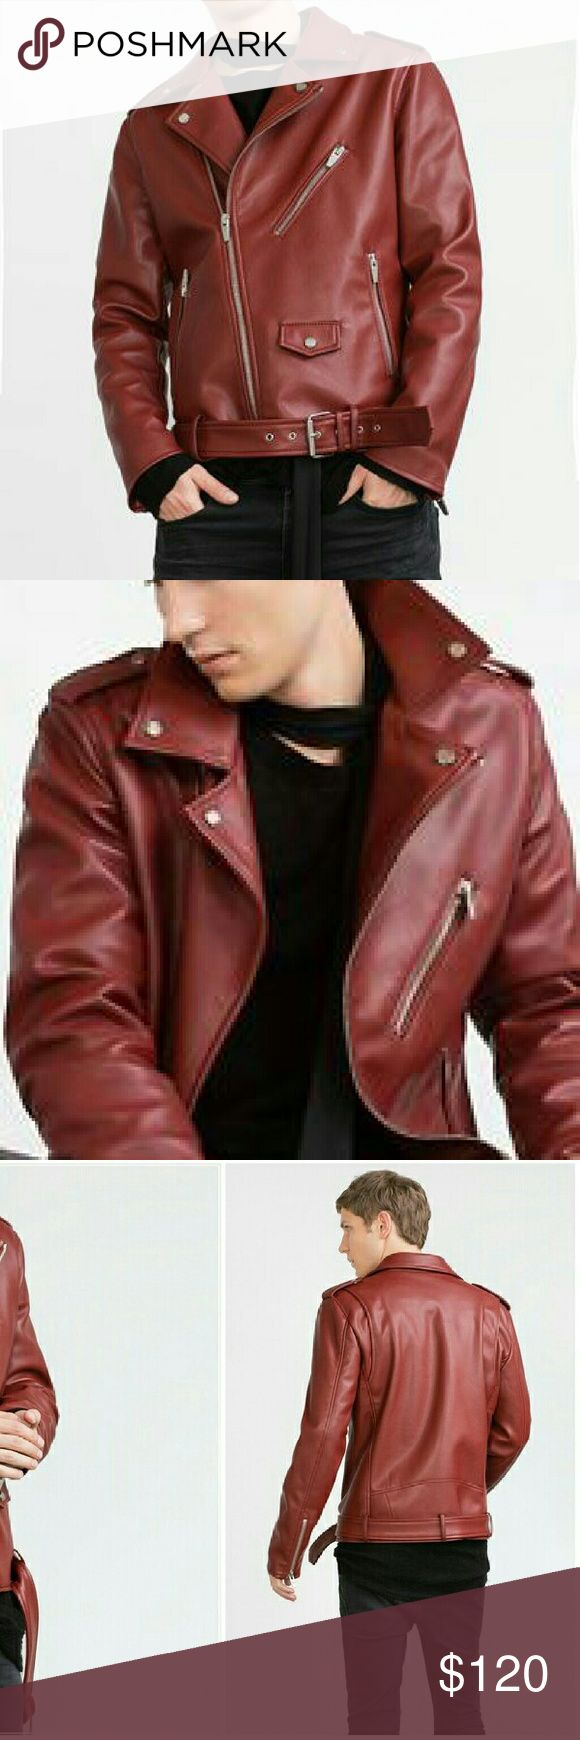 Nwt ZARA men's red faux leather moto jacket small New with tags Zara men's faux leather motorcycle jacket. Amazing quality. Size small Zara Jackets & Coats Bomber & Varsity